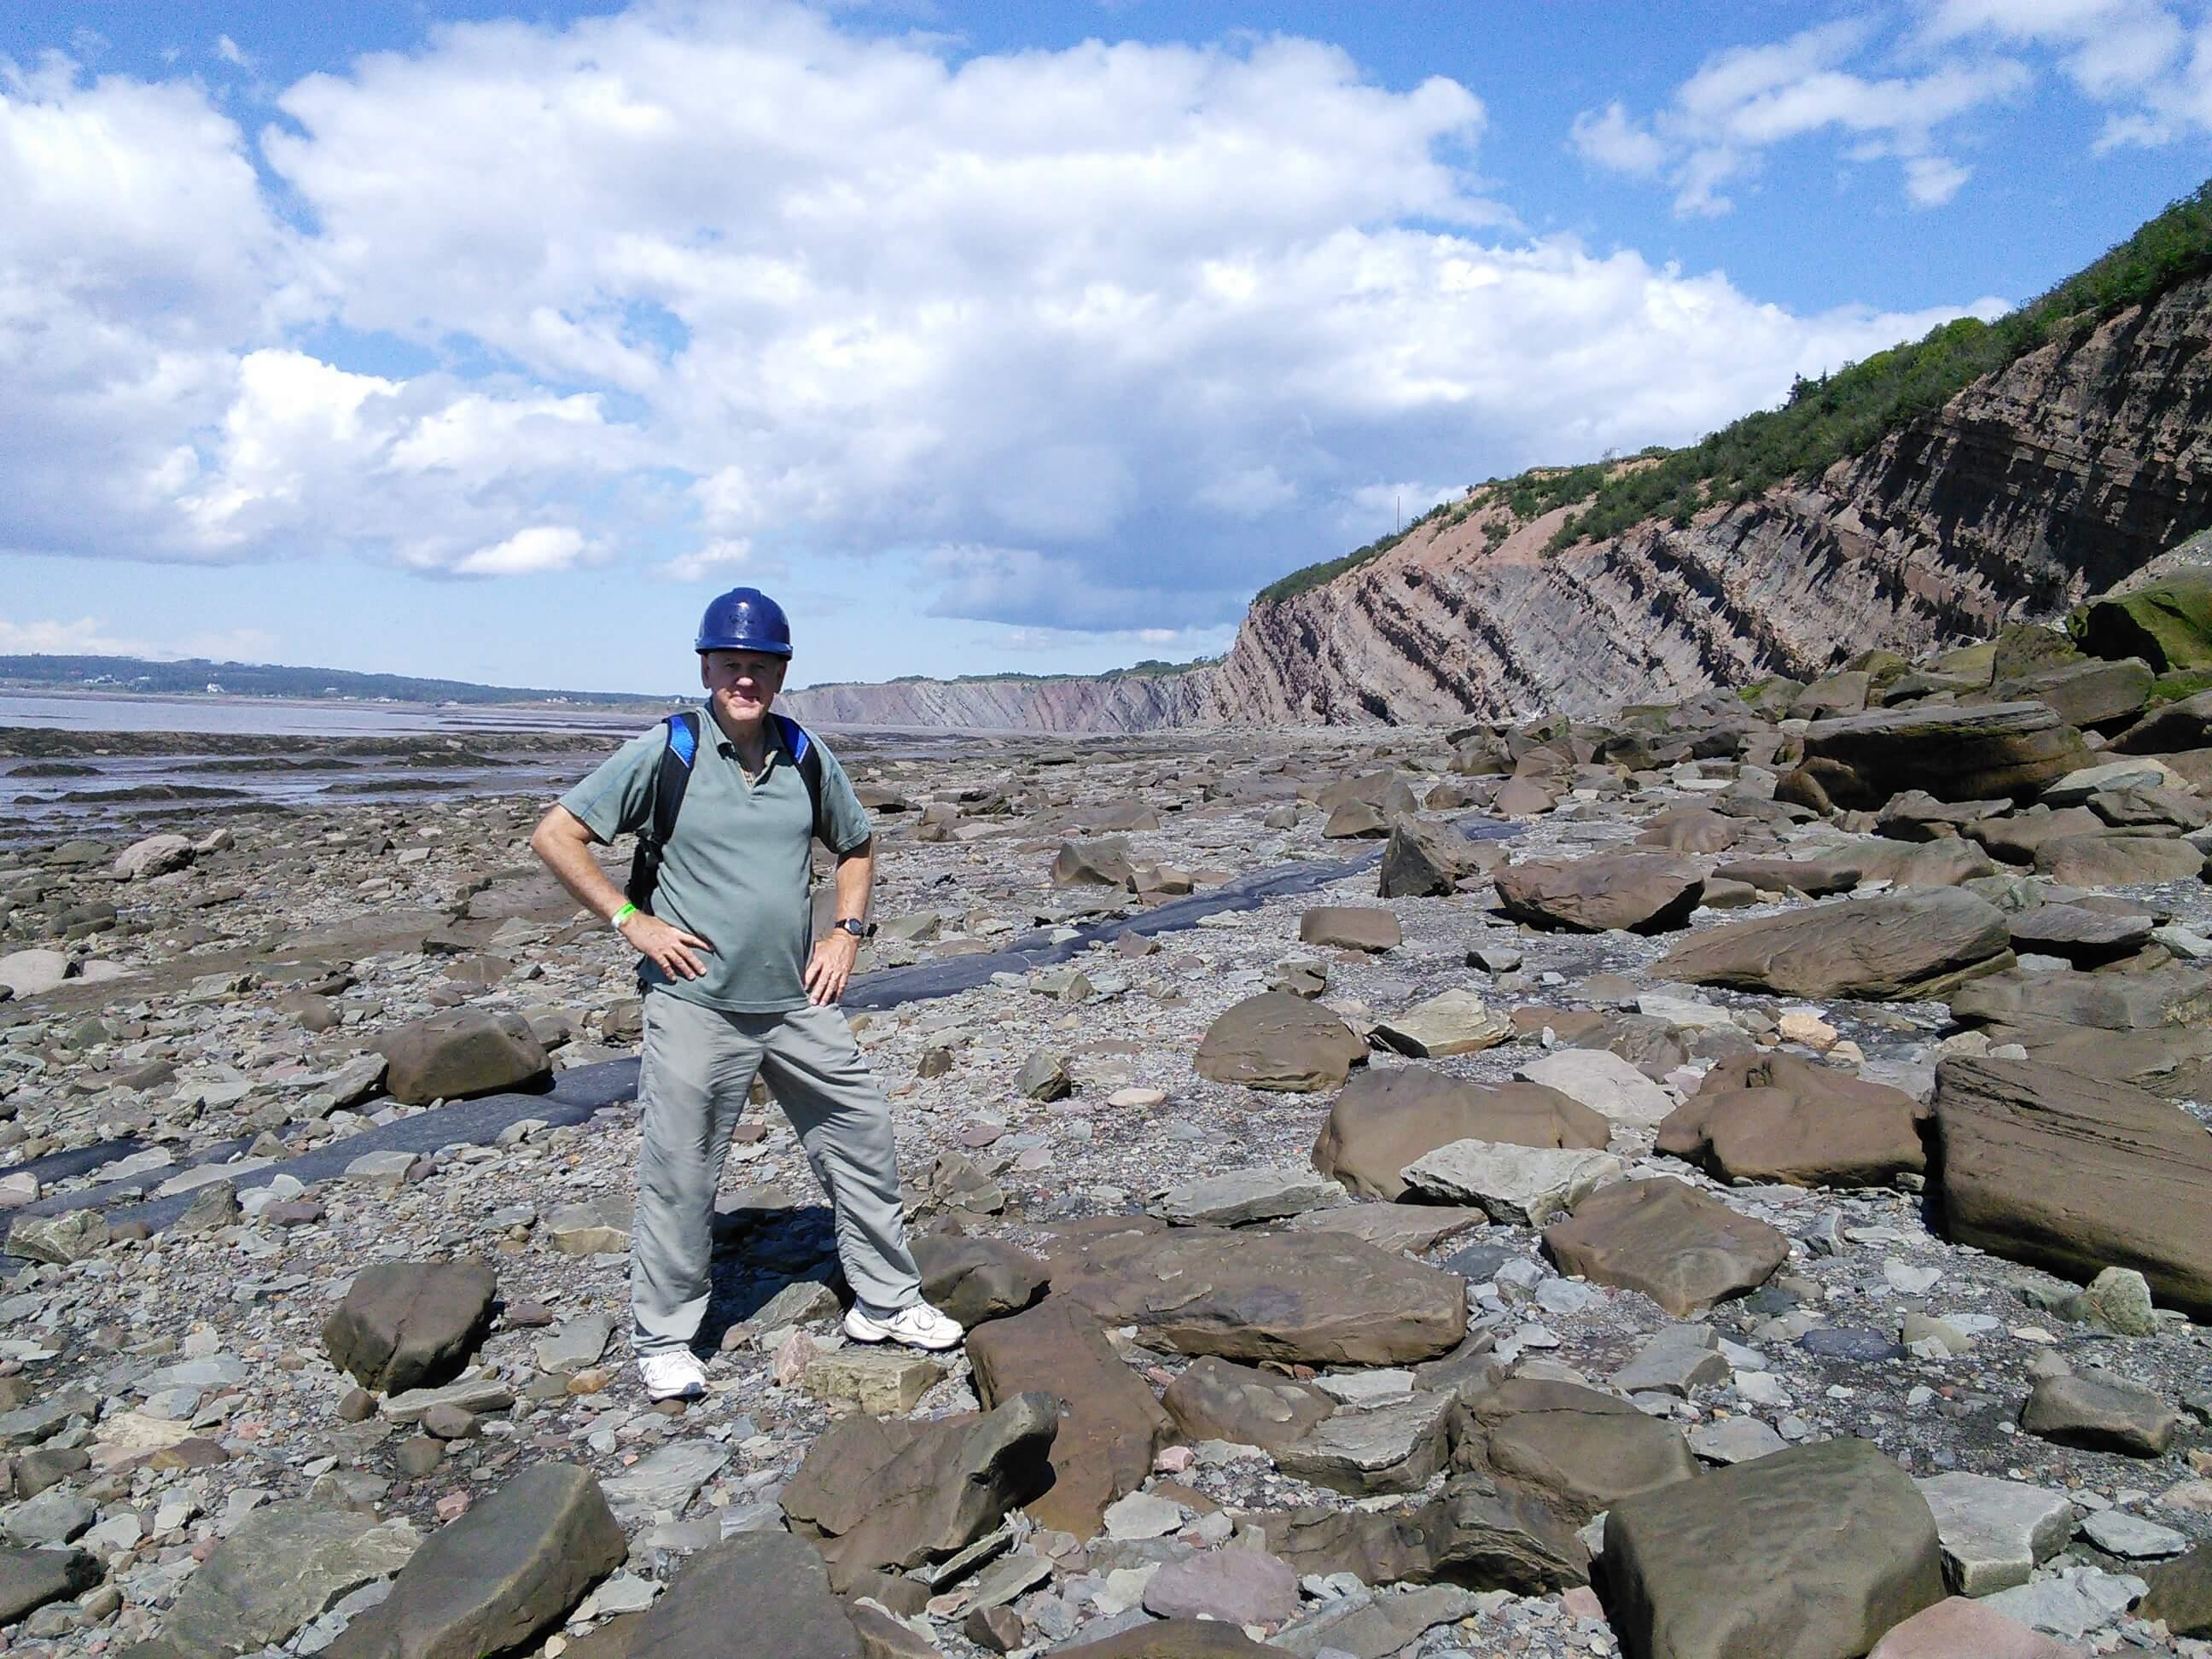 Lyell's corner, Joggins Fossil Cliff, NS